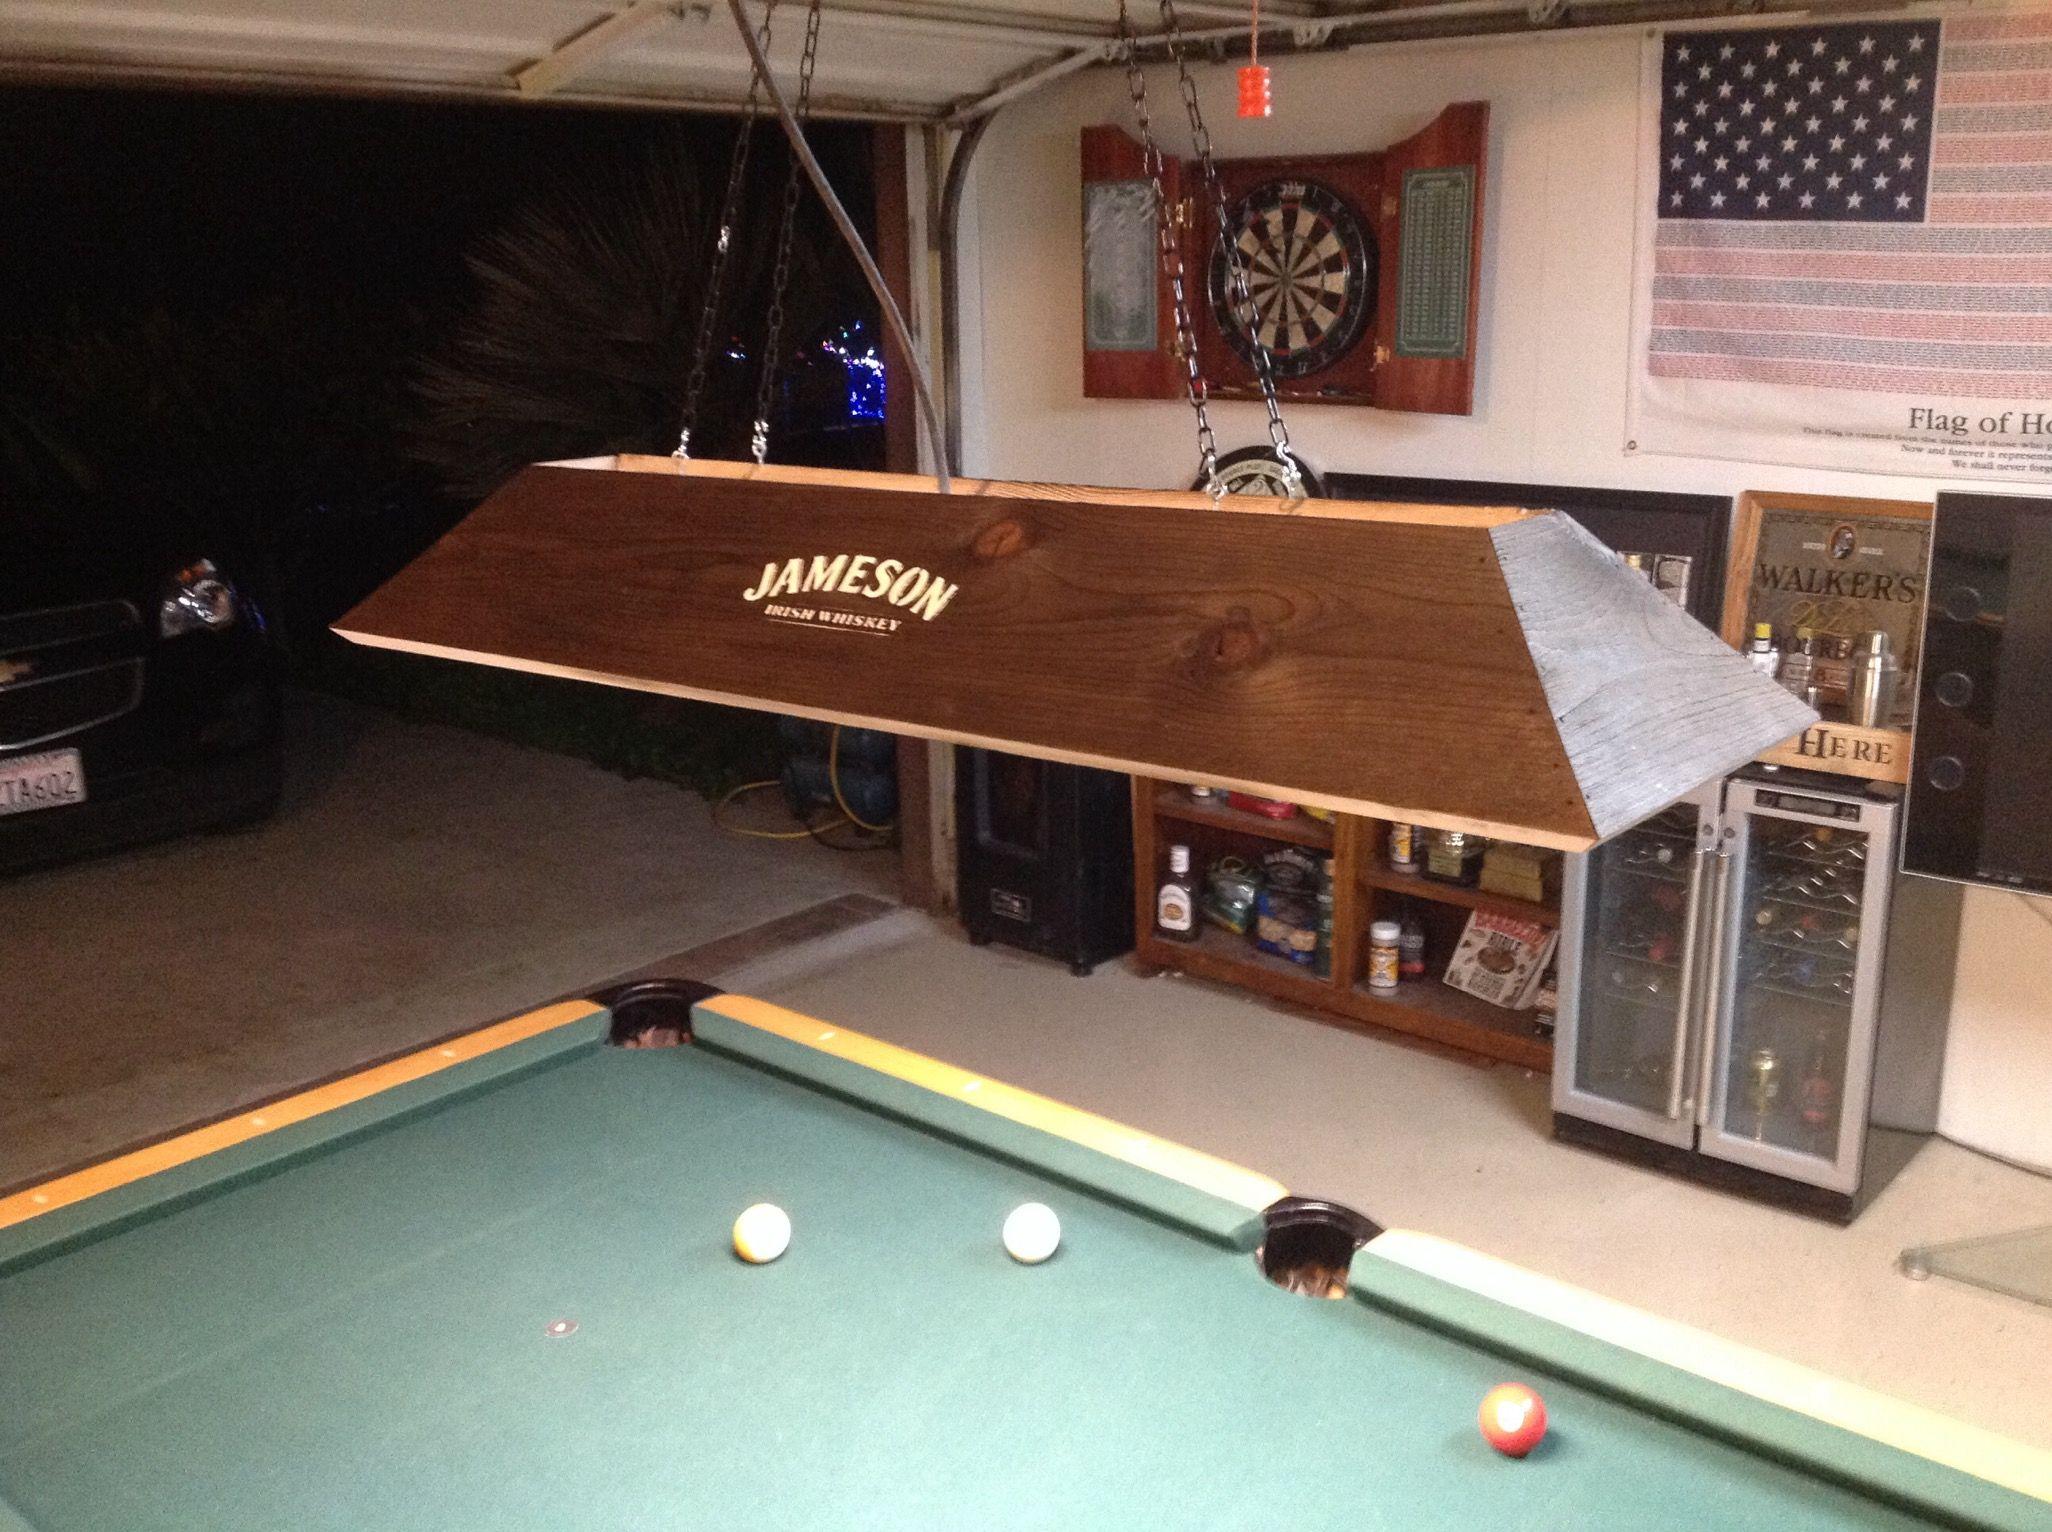 Jameson Irish Whiskey Pool Table Light | Mancave Lights ...